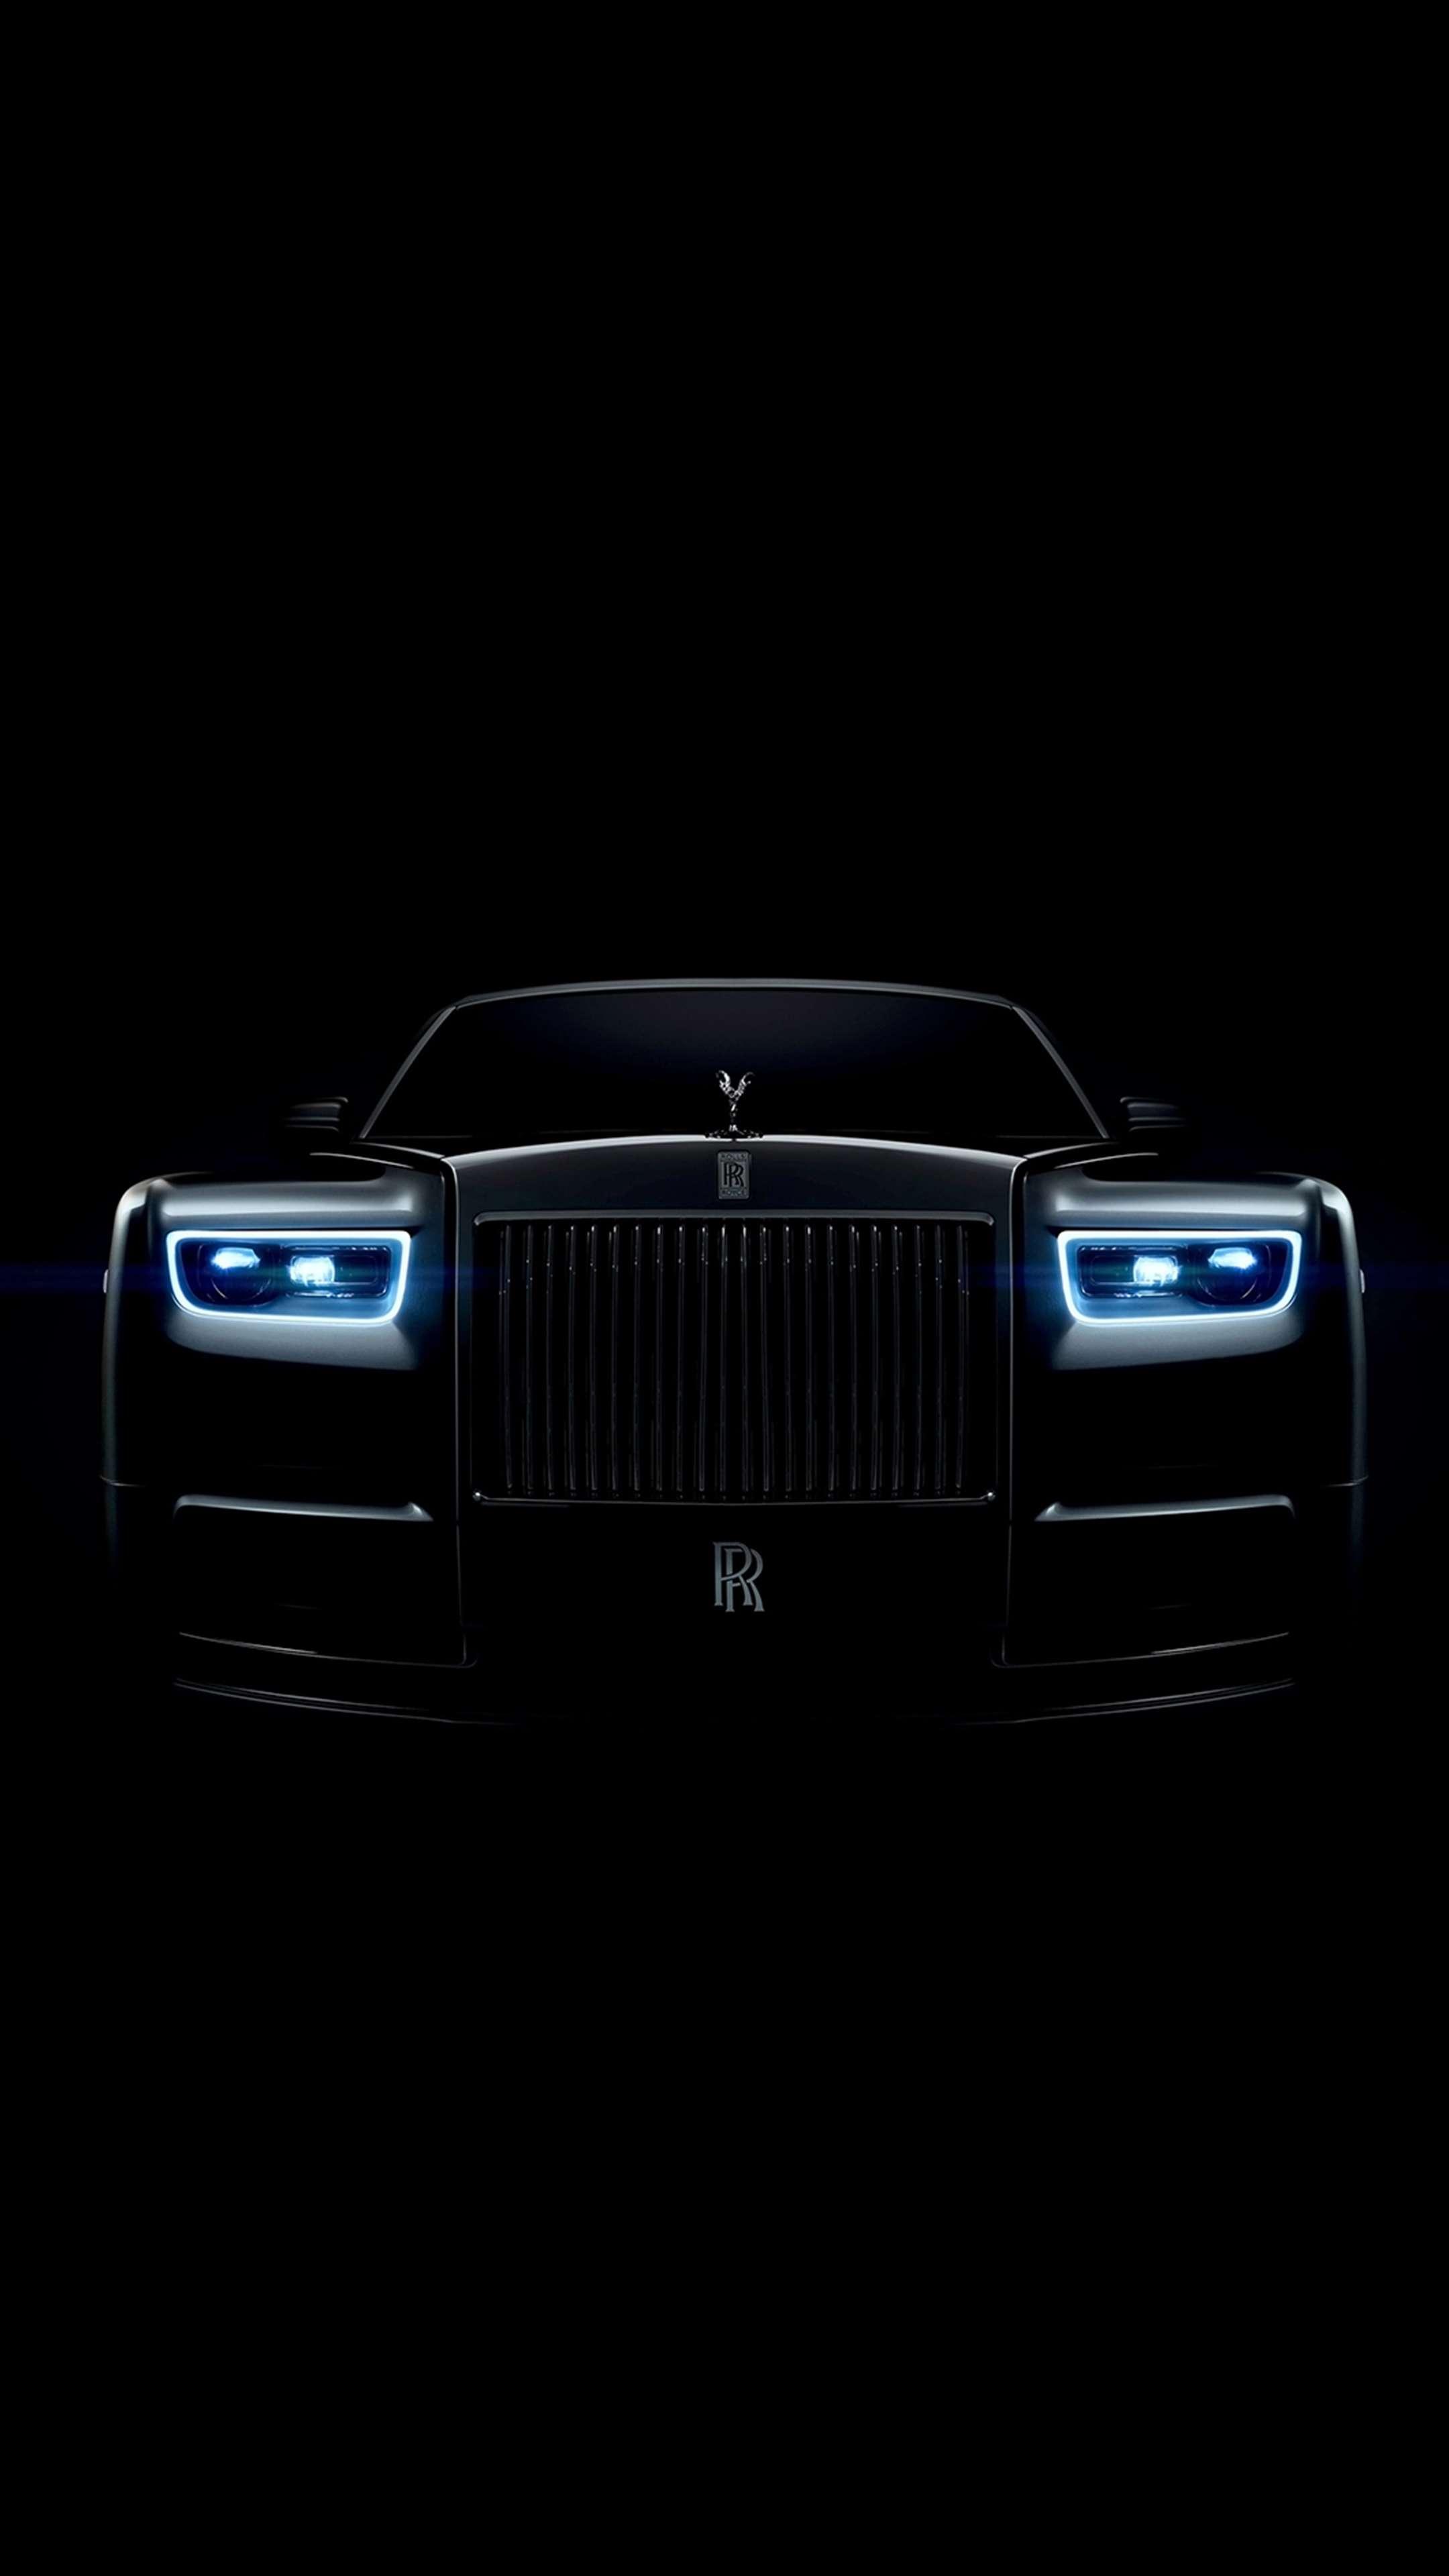 Rolls Royce Phantom Dark iPhone Wallpaper